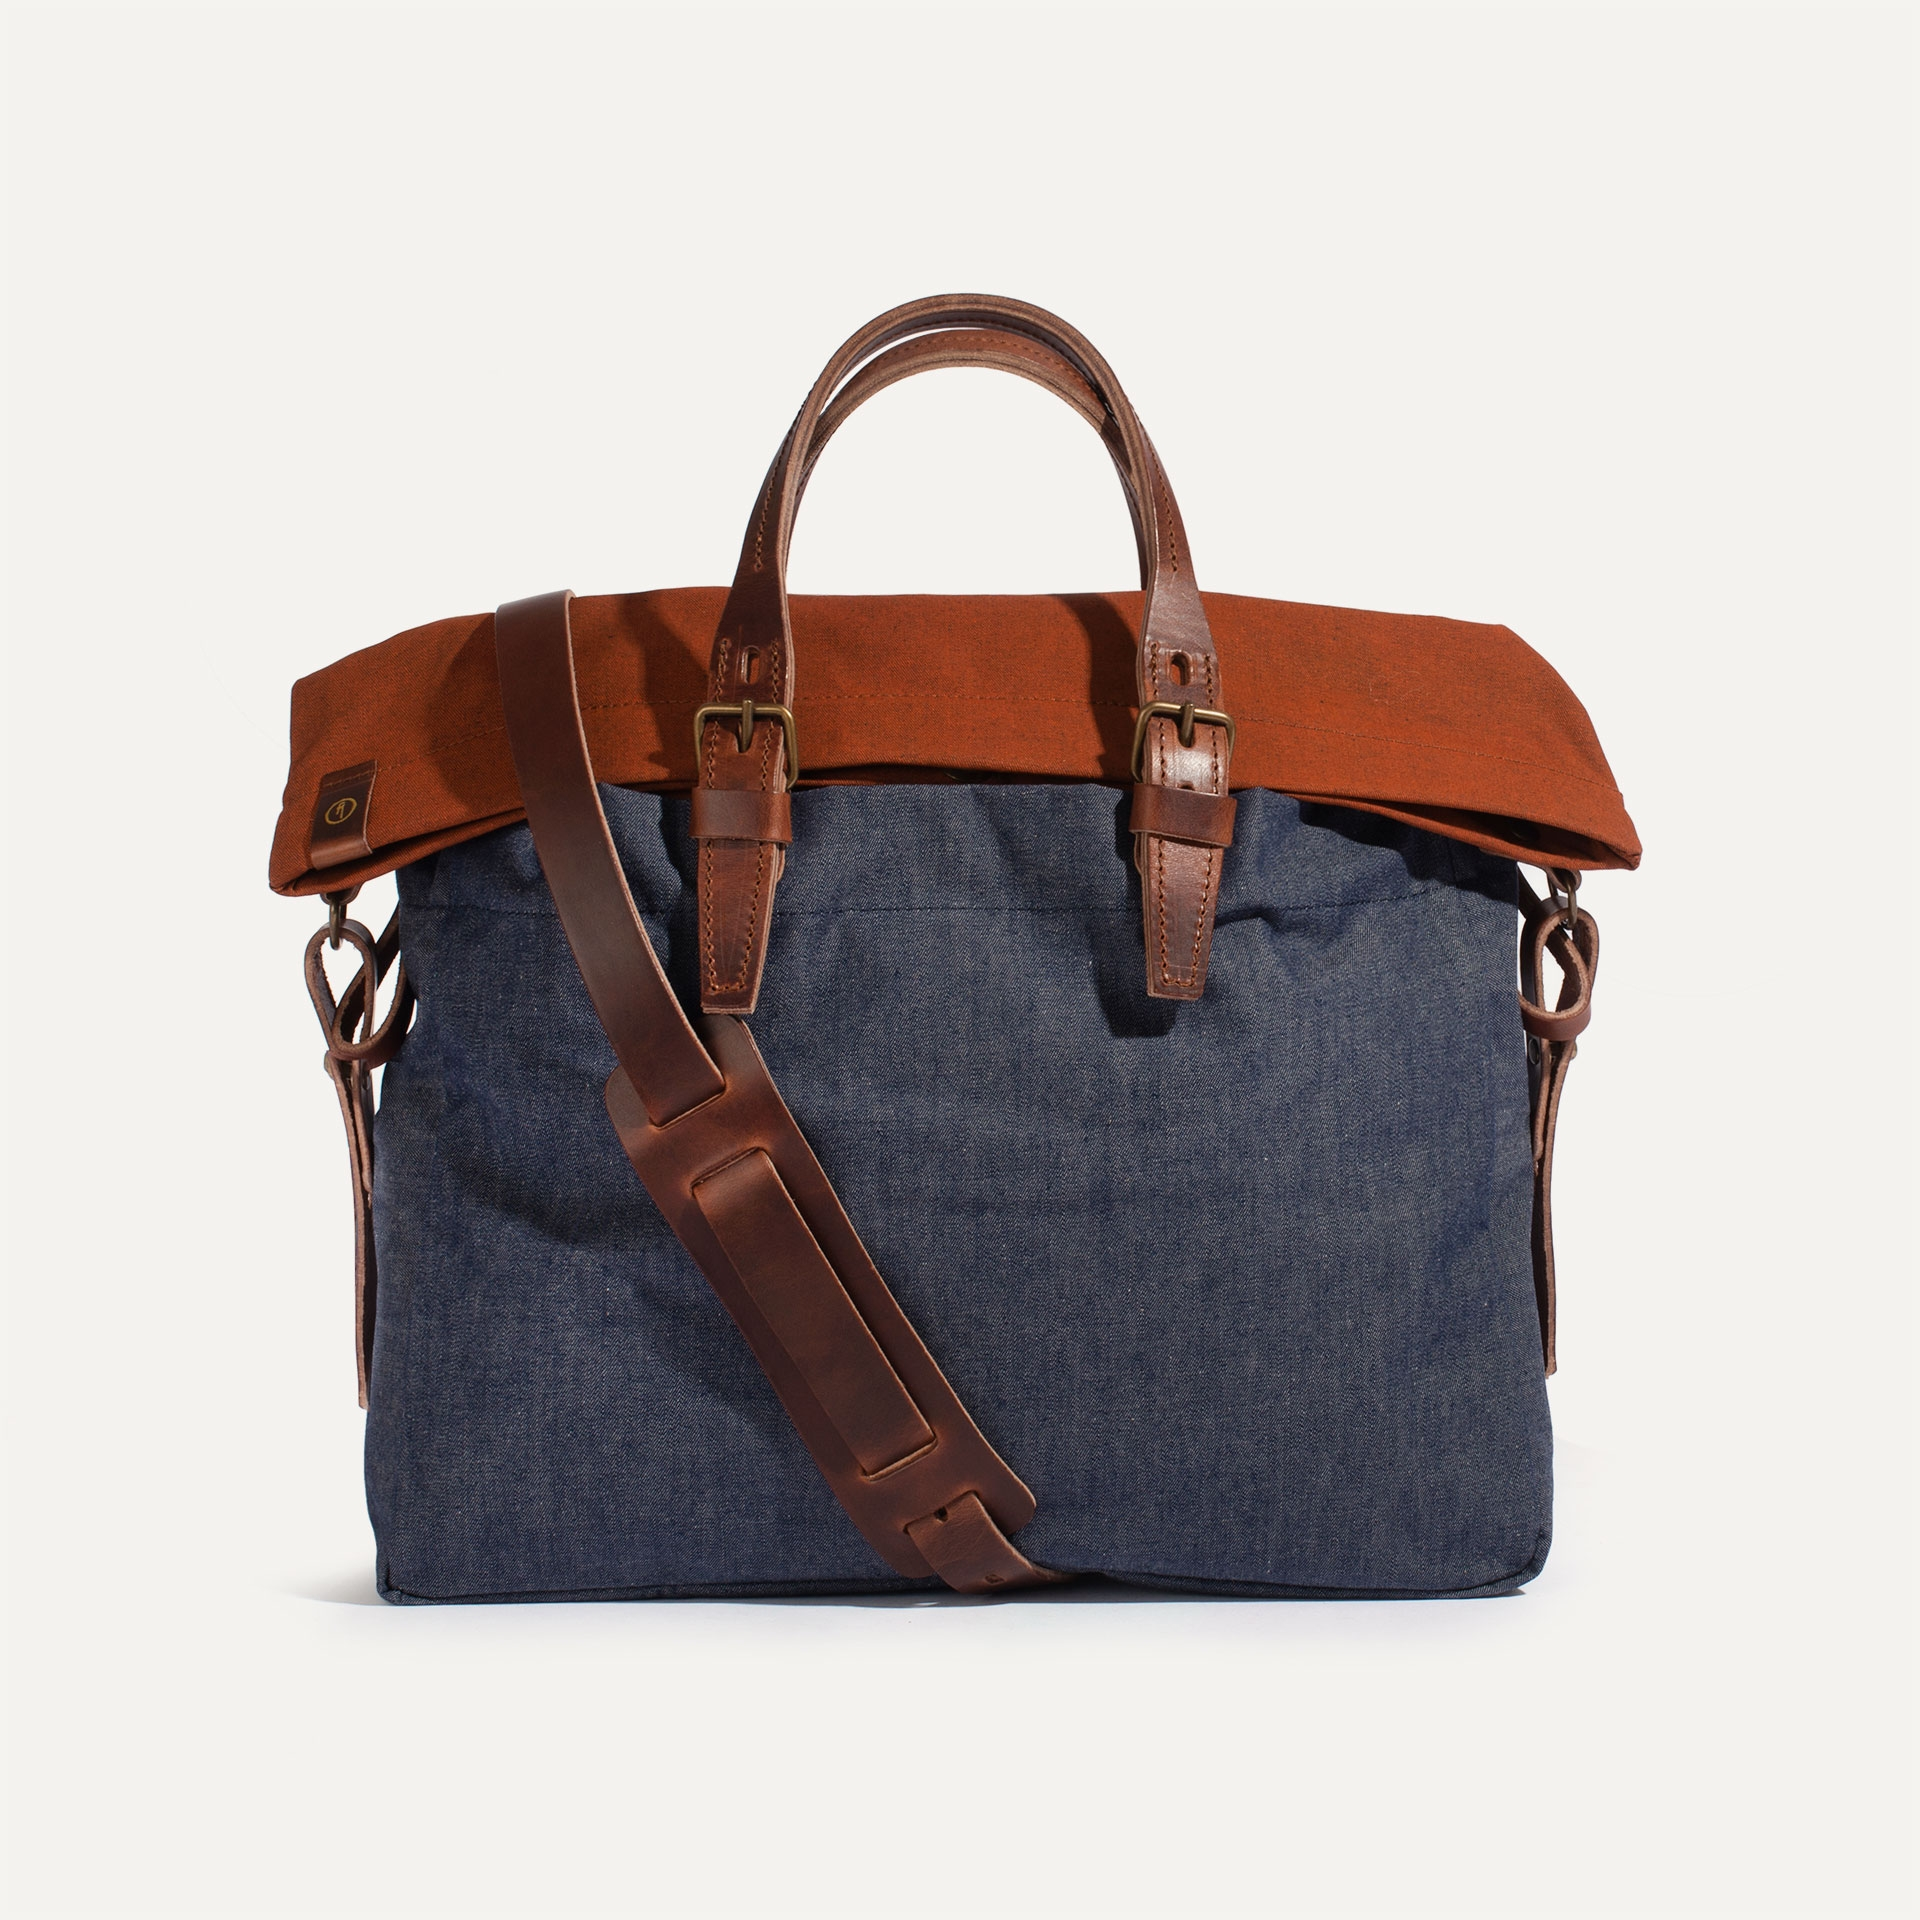 Remix business bag - Denim/Terra cotta (image n°1)